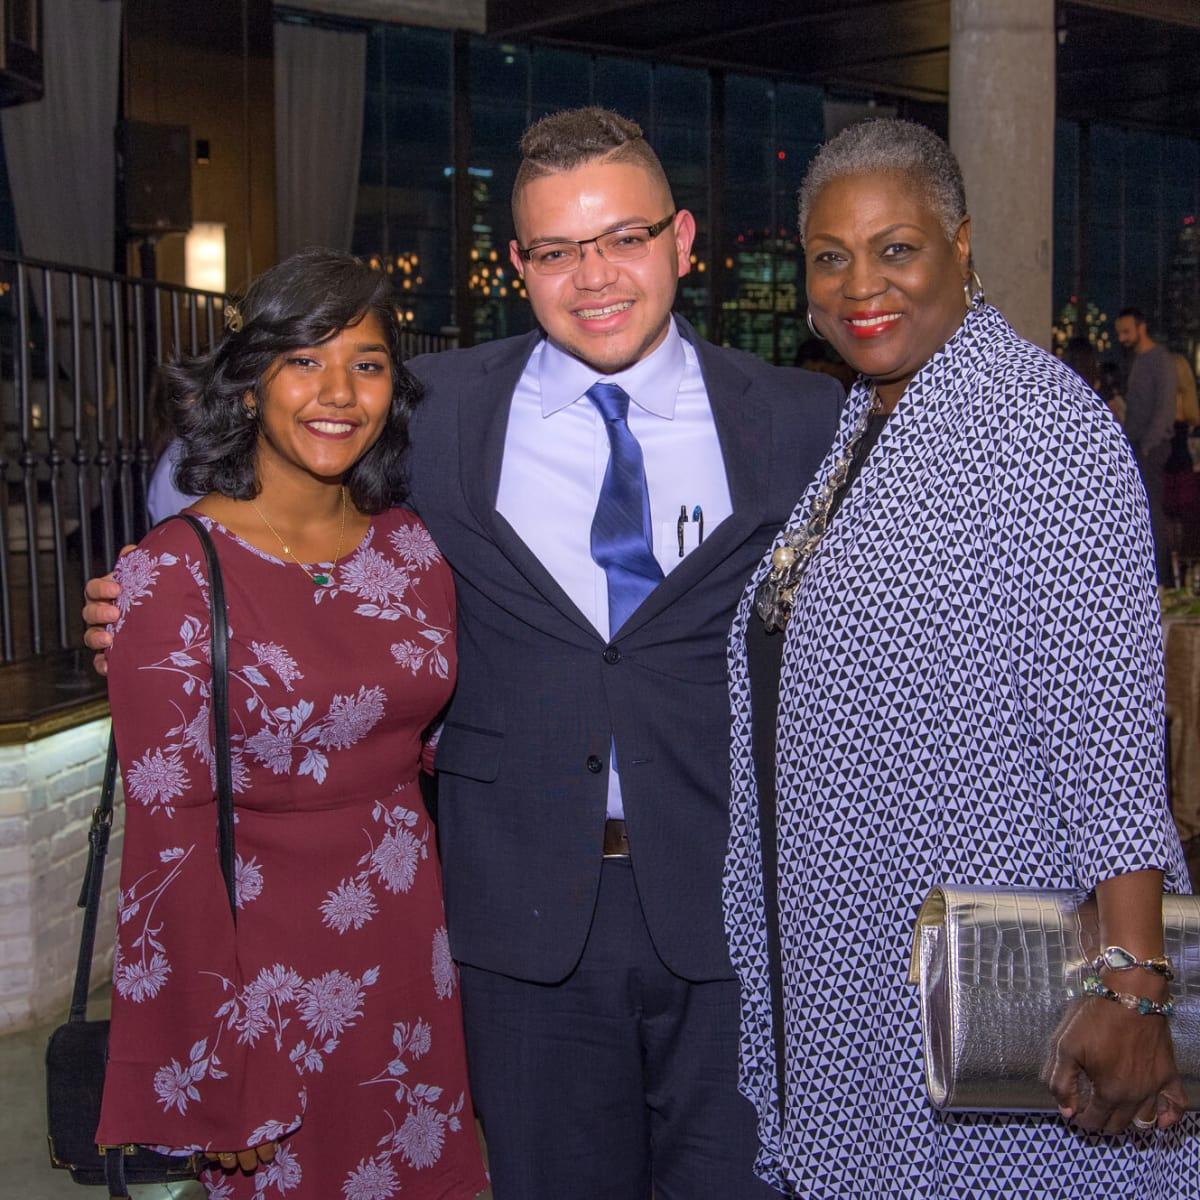 Houston, Writers in the Schools gala, Dec 2016, Fareena Arefeen, Andrew White, Dr. Rhea Brown Lawson